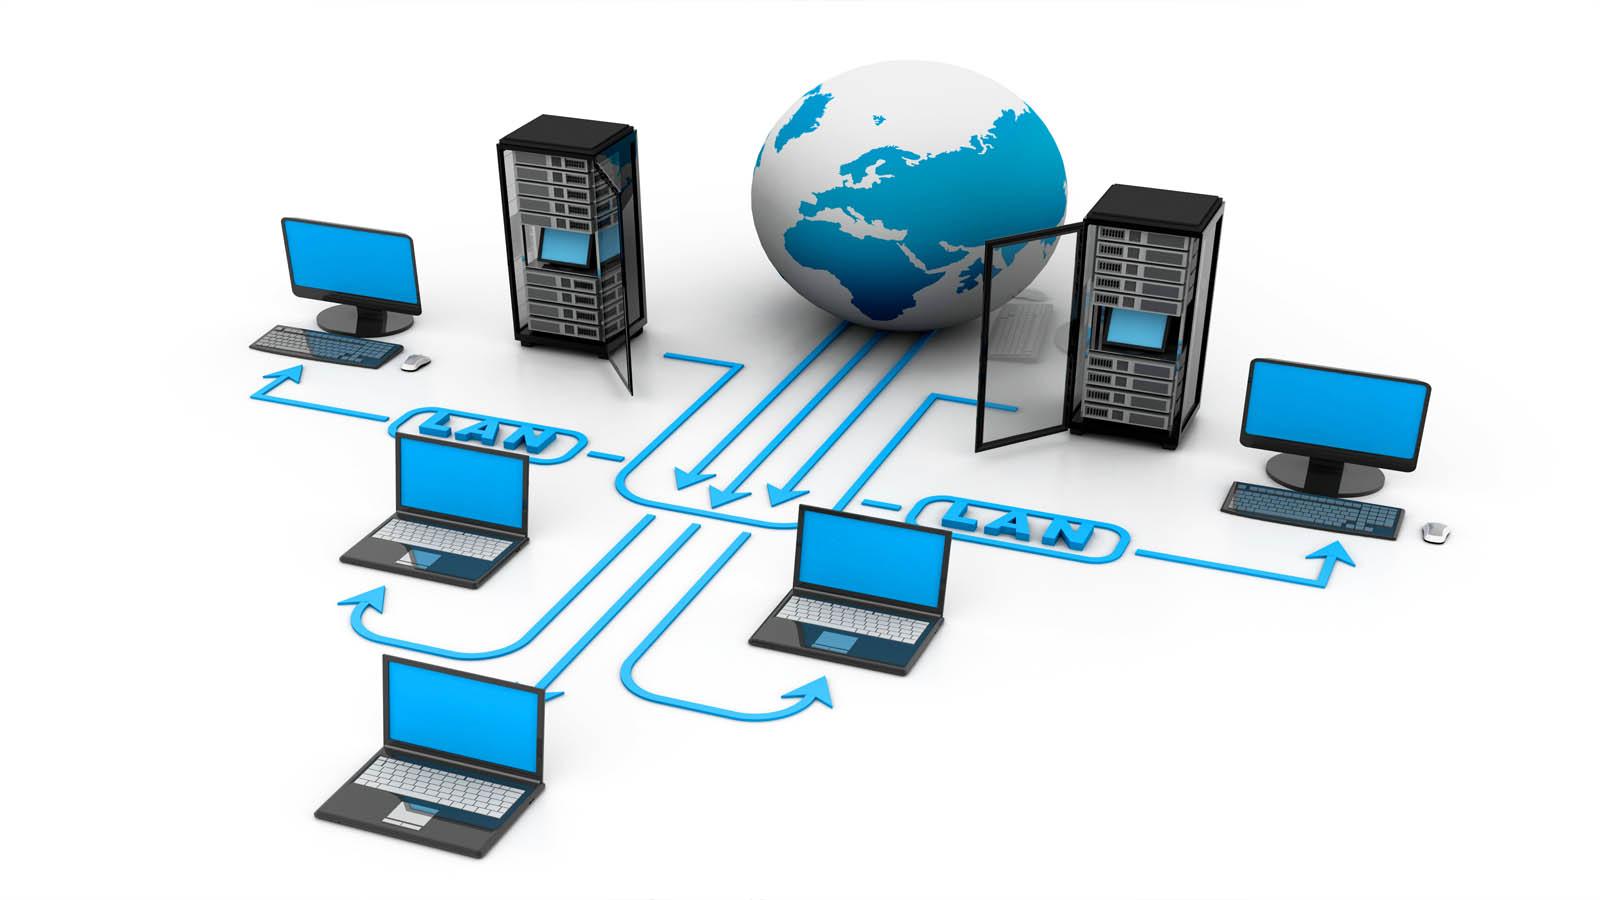 کاربرد شبکه های کامپیوتری